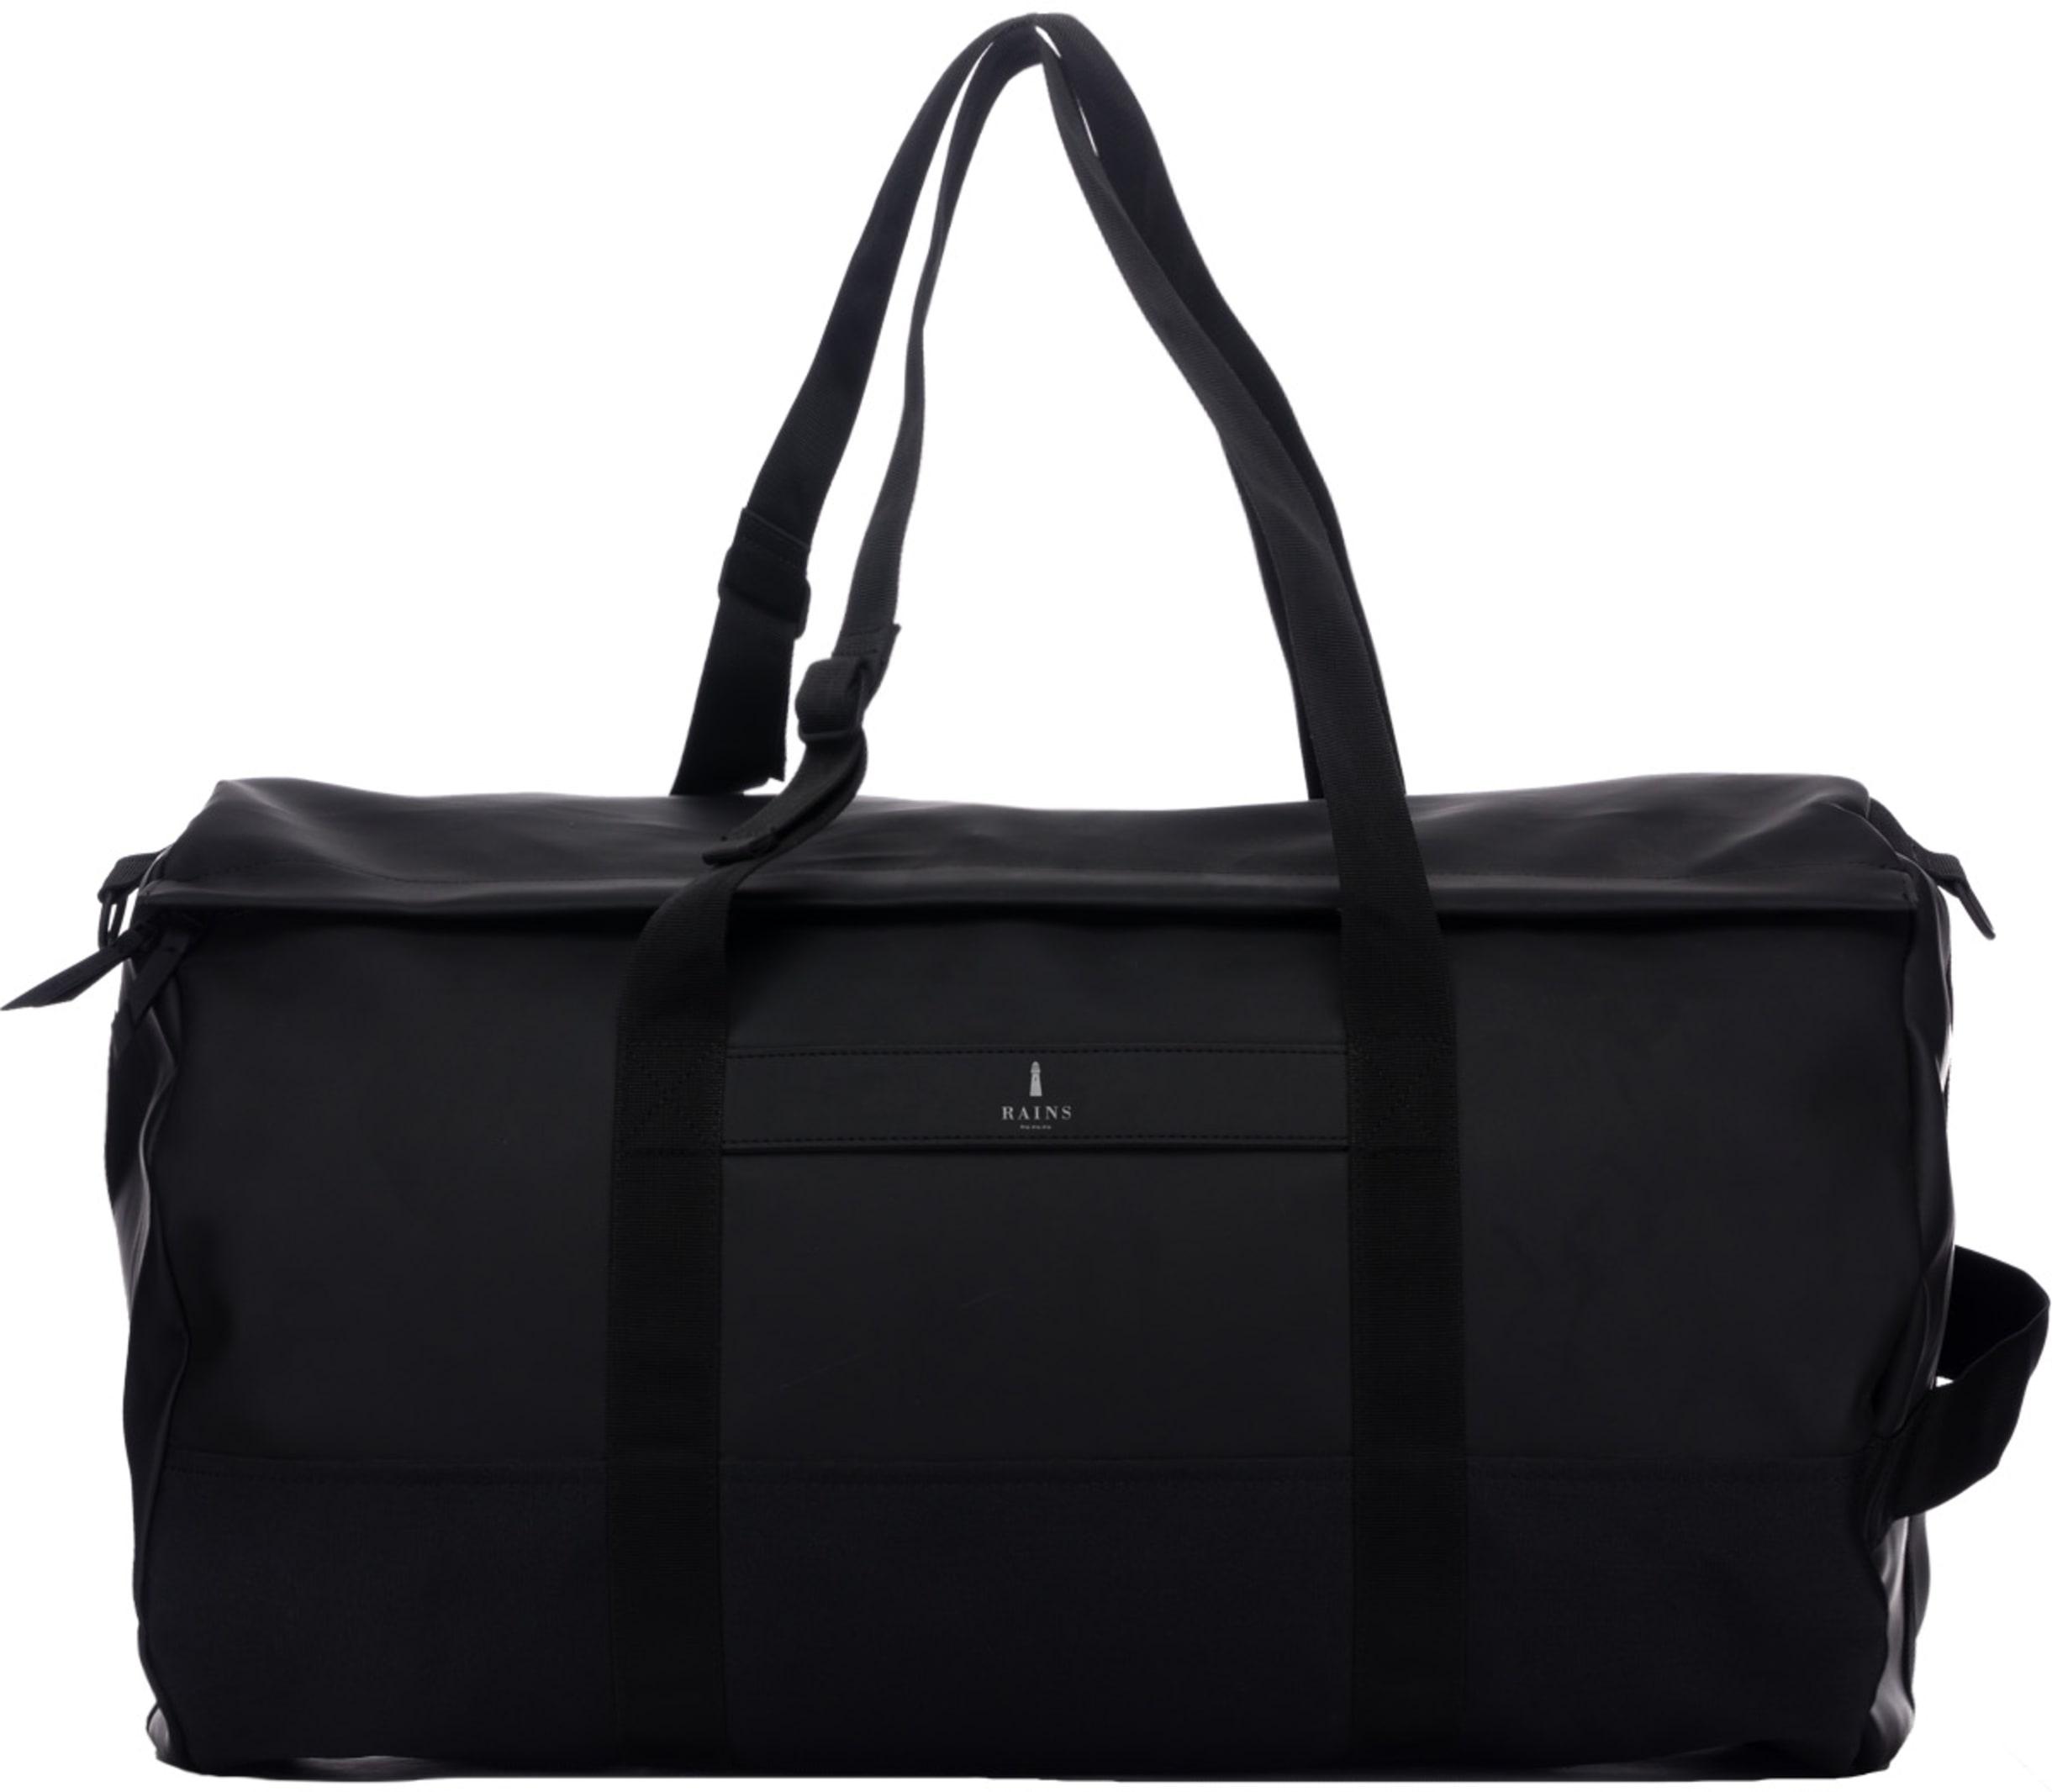 f2d49c6ed08 Rains: Travel Duffel Bag - Black | influenceu